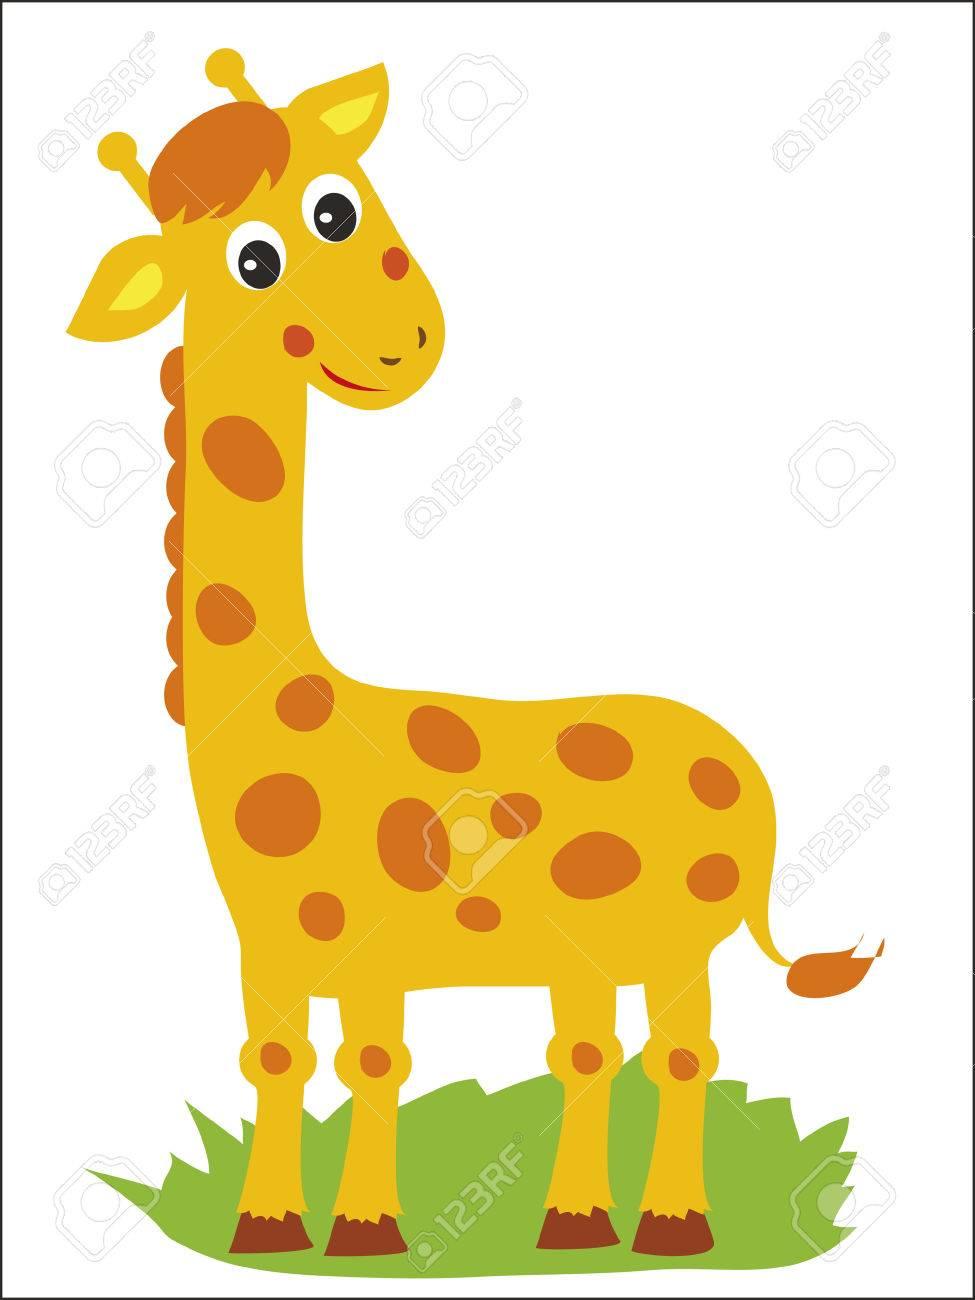 giraffe vector giraffe standing giraffe african animal jolly rh 123rf com giraffe vector free download giraffe vector art